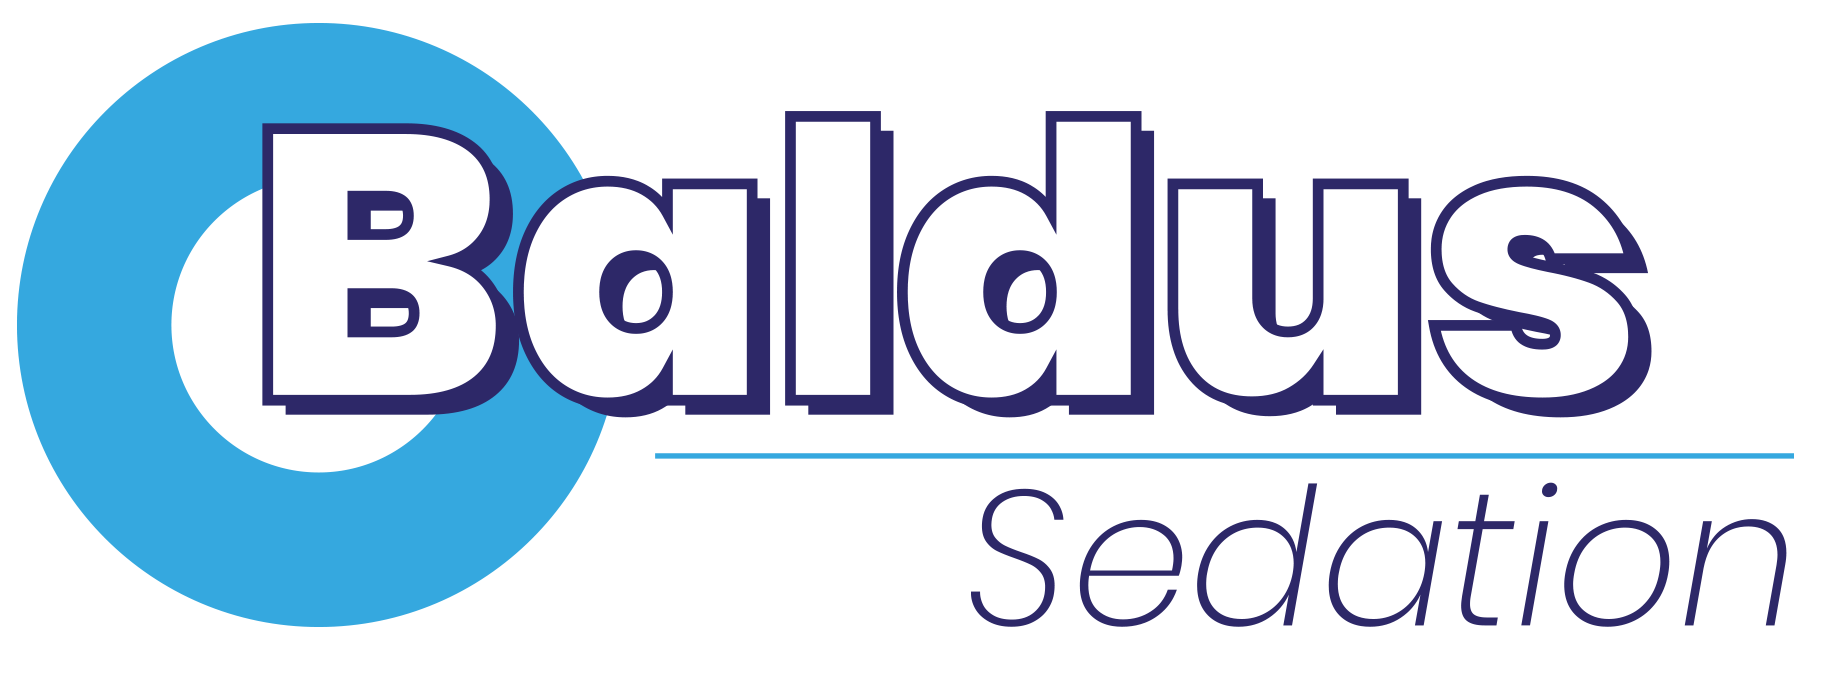 Baldus Sedation GmbH & Co. KG